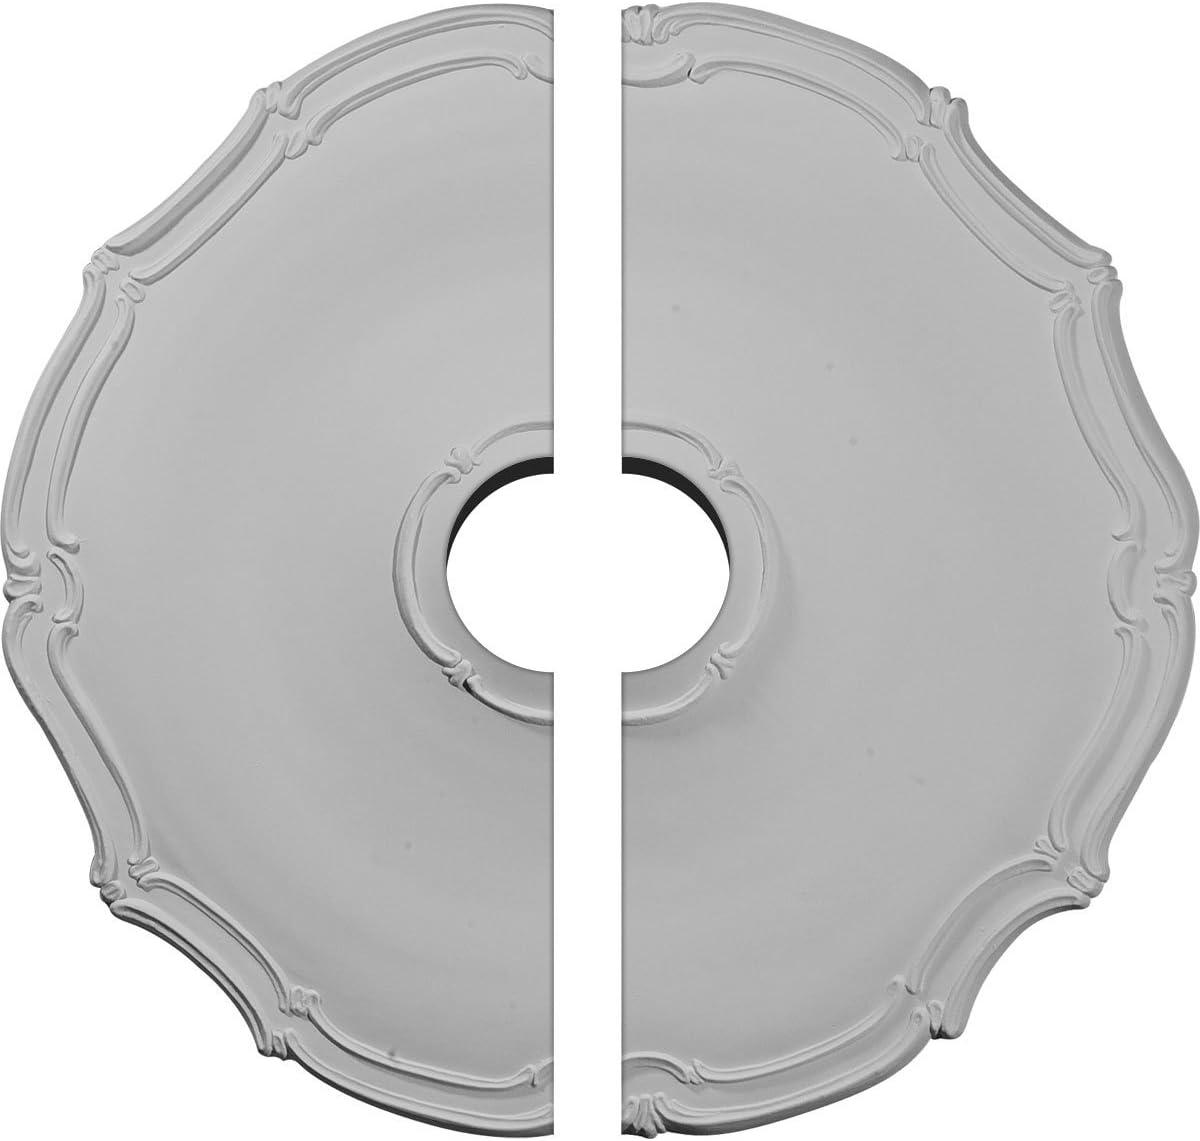 Ekena Millwork We OFFer Quality inspection at cheap prices CM18PO2-03500 Pompeii Ceiling Medallion 8